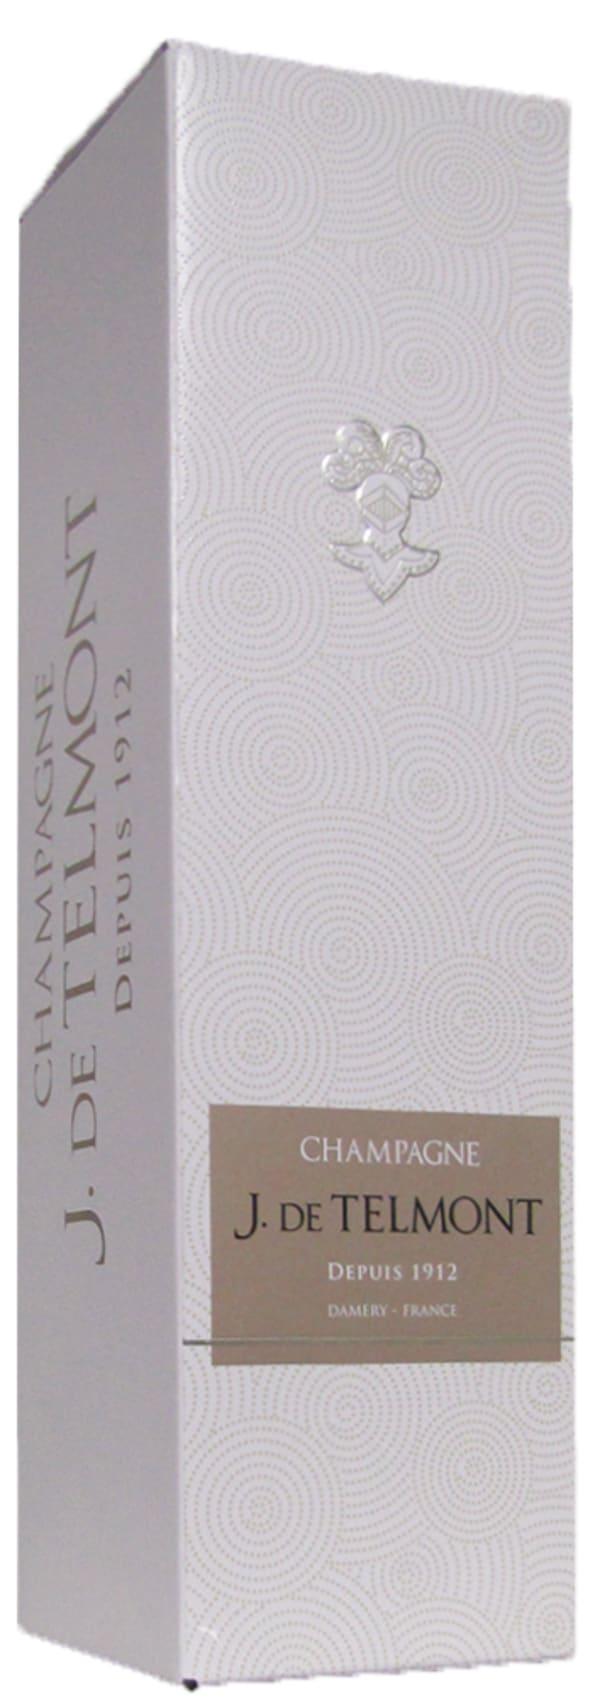 J. de Telmont Heritage Champagne Brut 1976